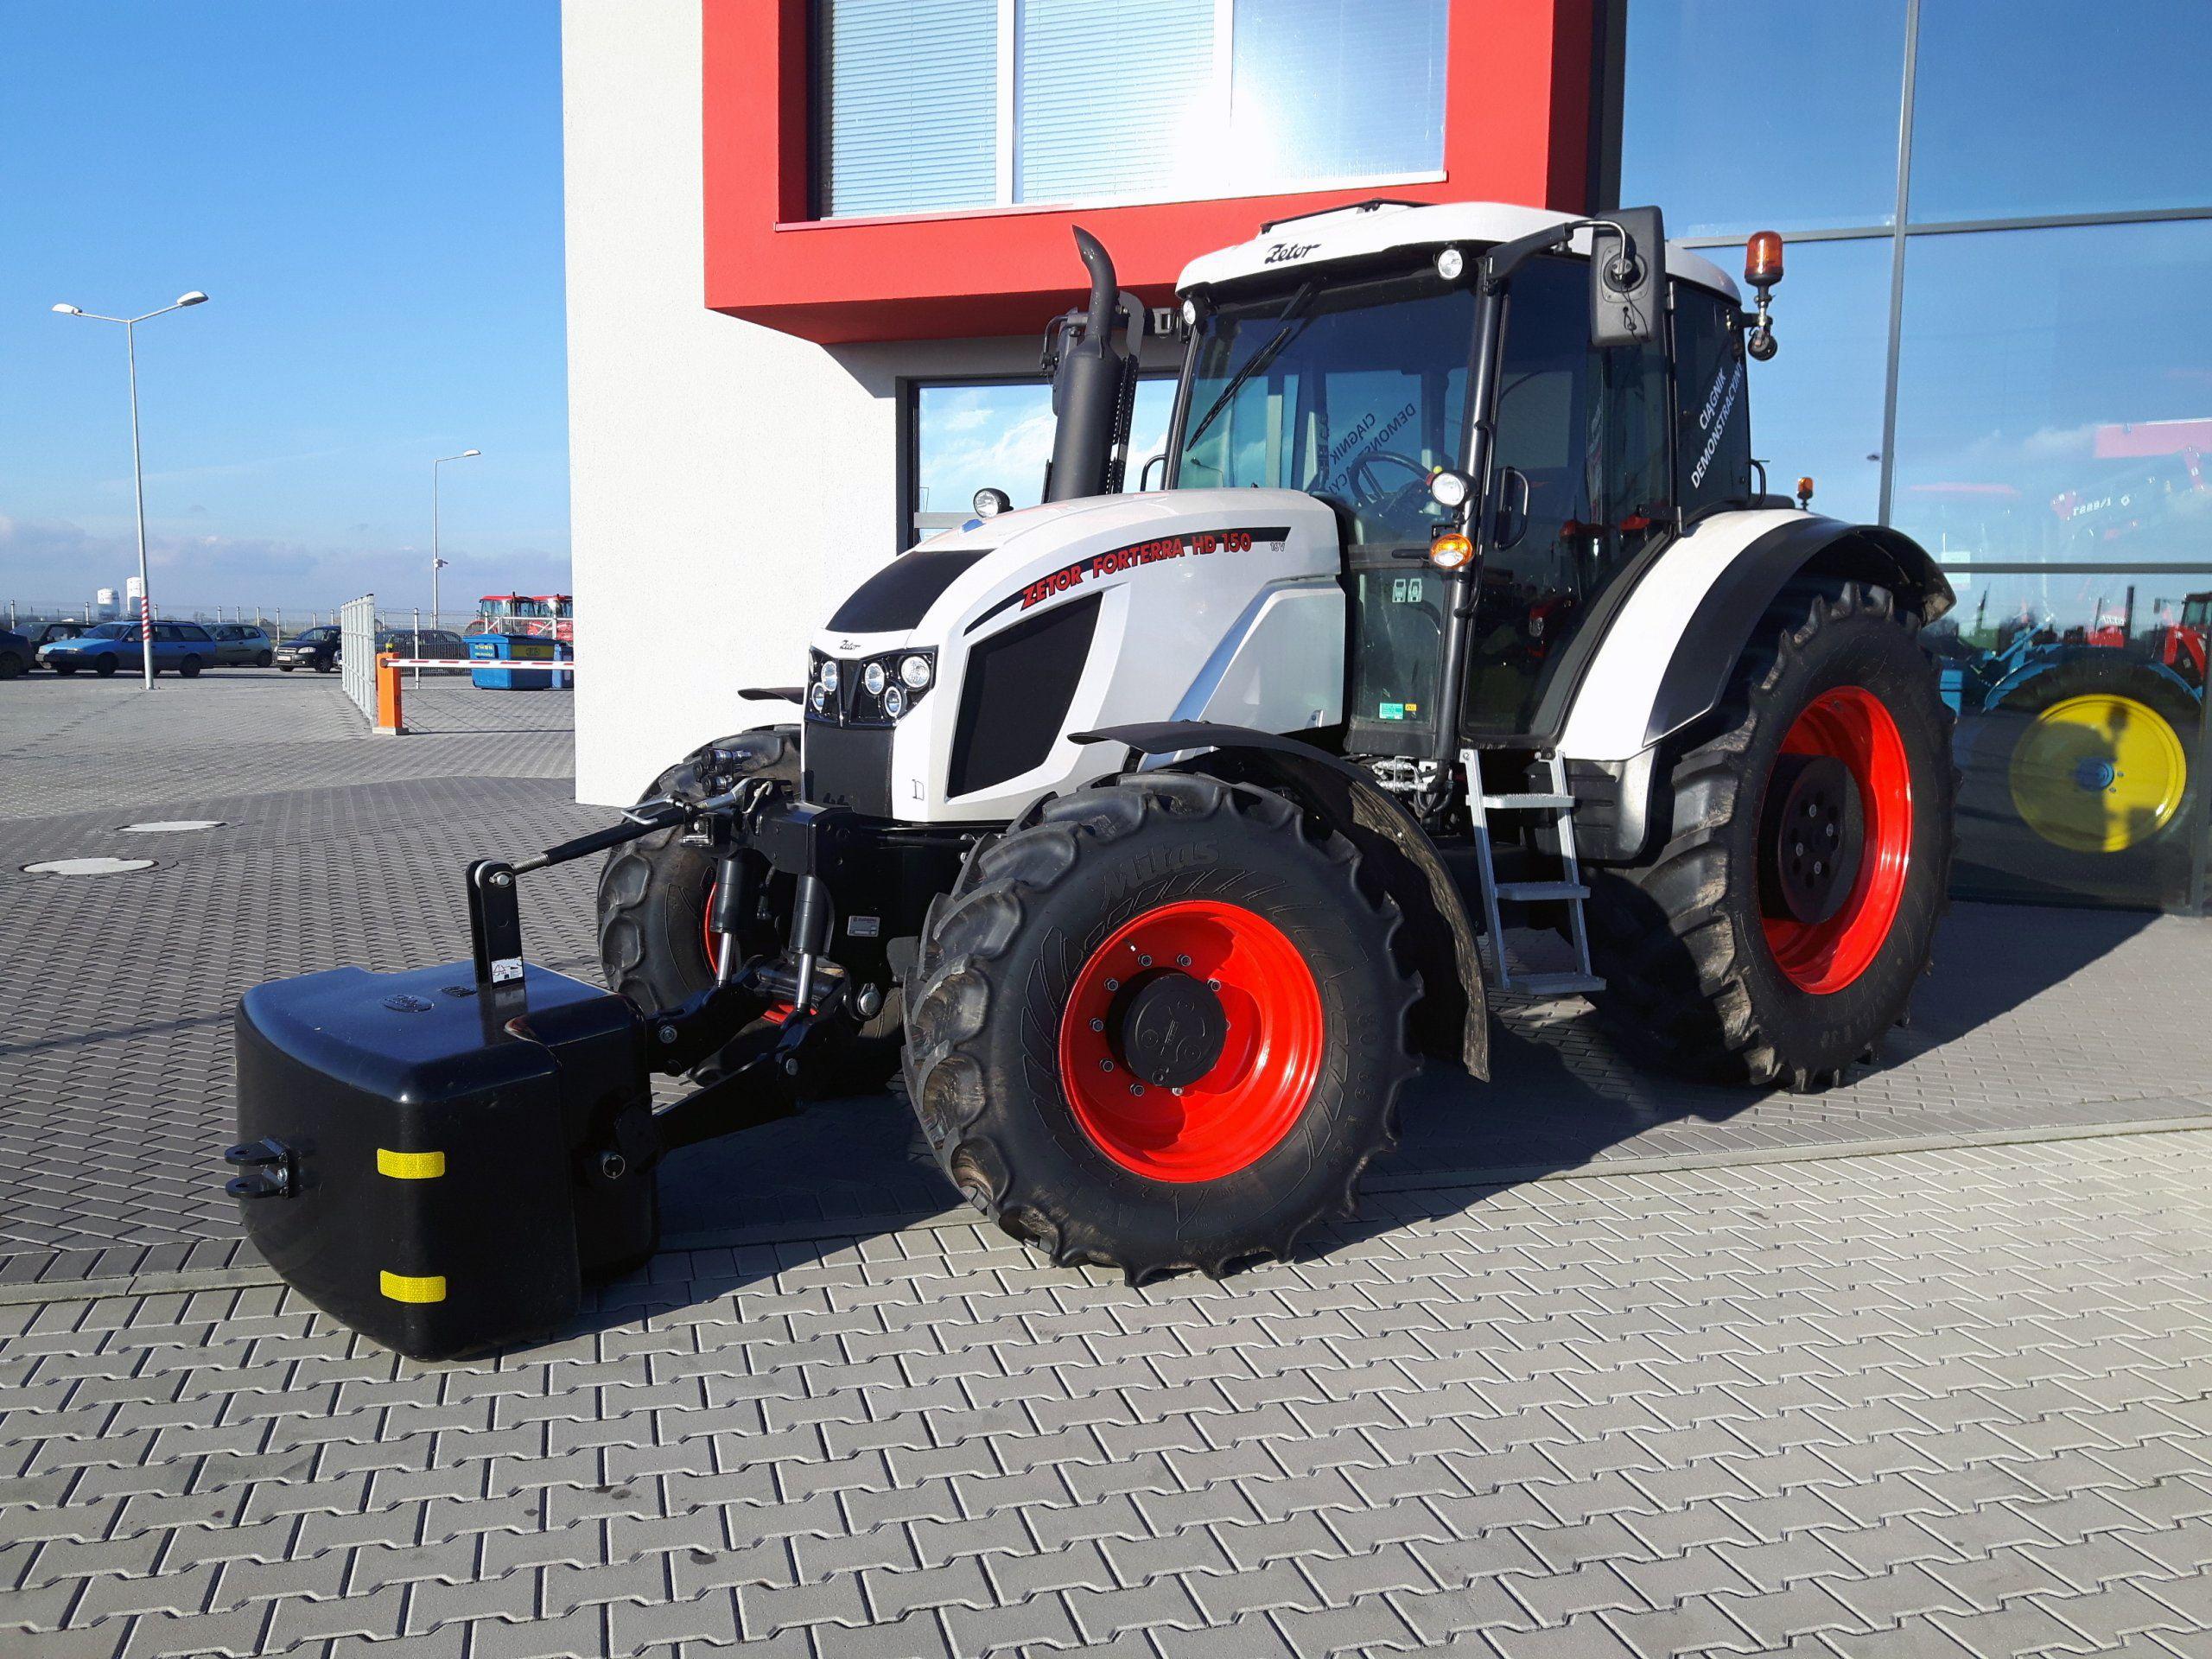 Zetor Forterra Hd 150 Landmaschinen Landwirtschaft Fernseher